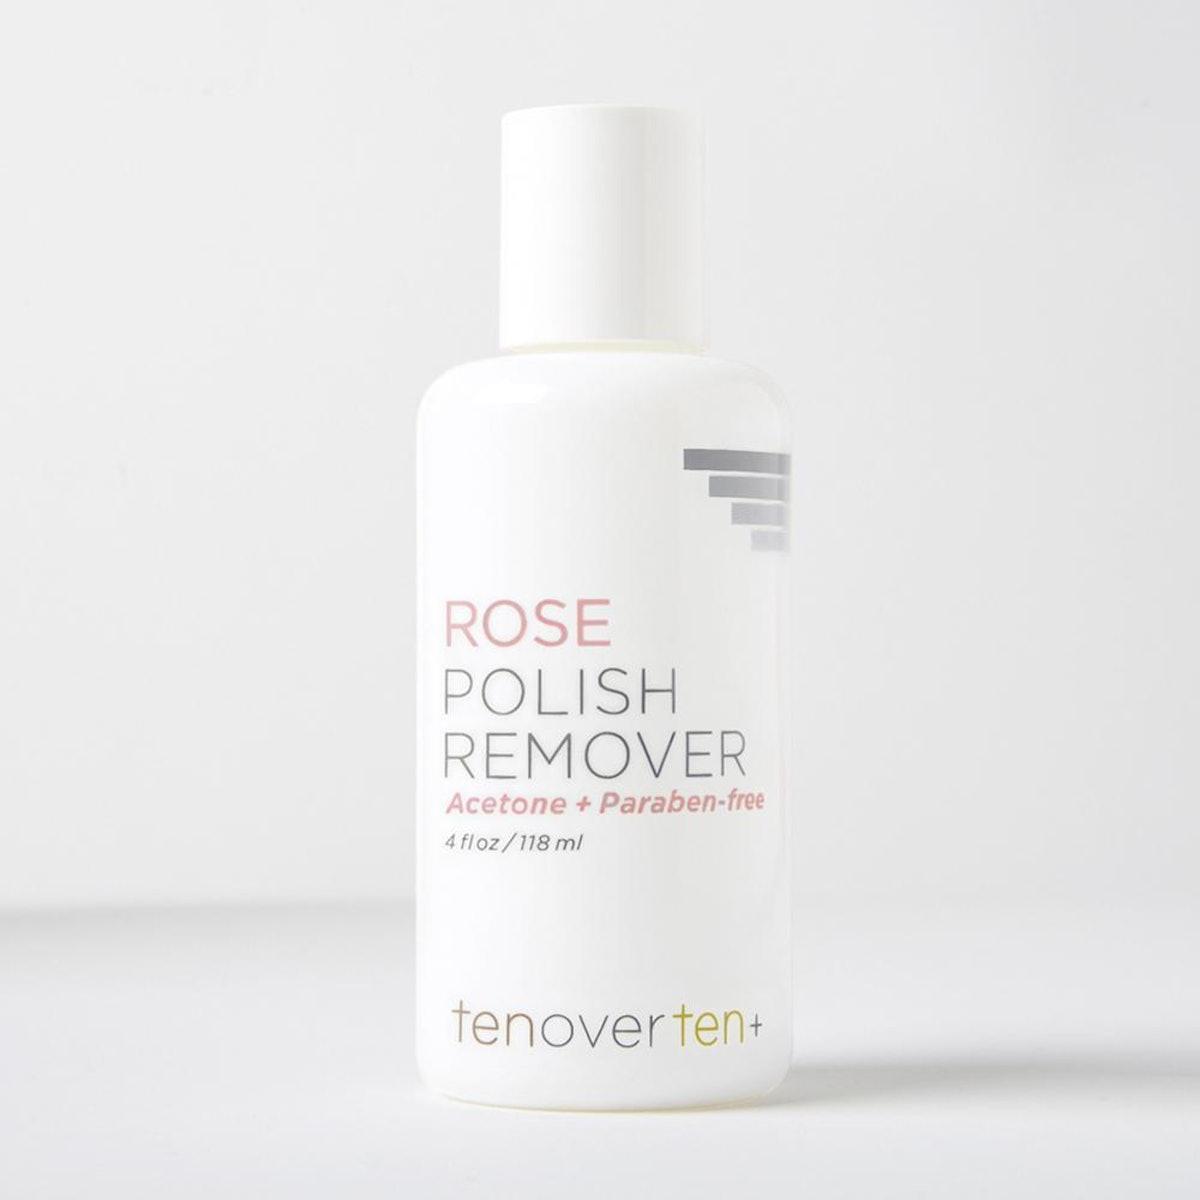 Rose Polish Remover